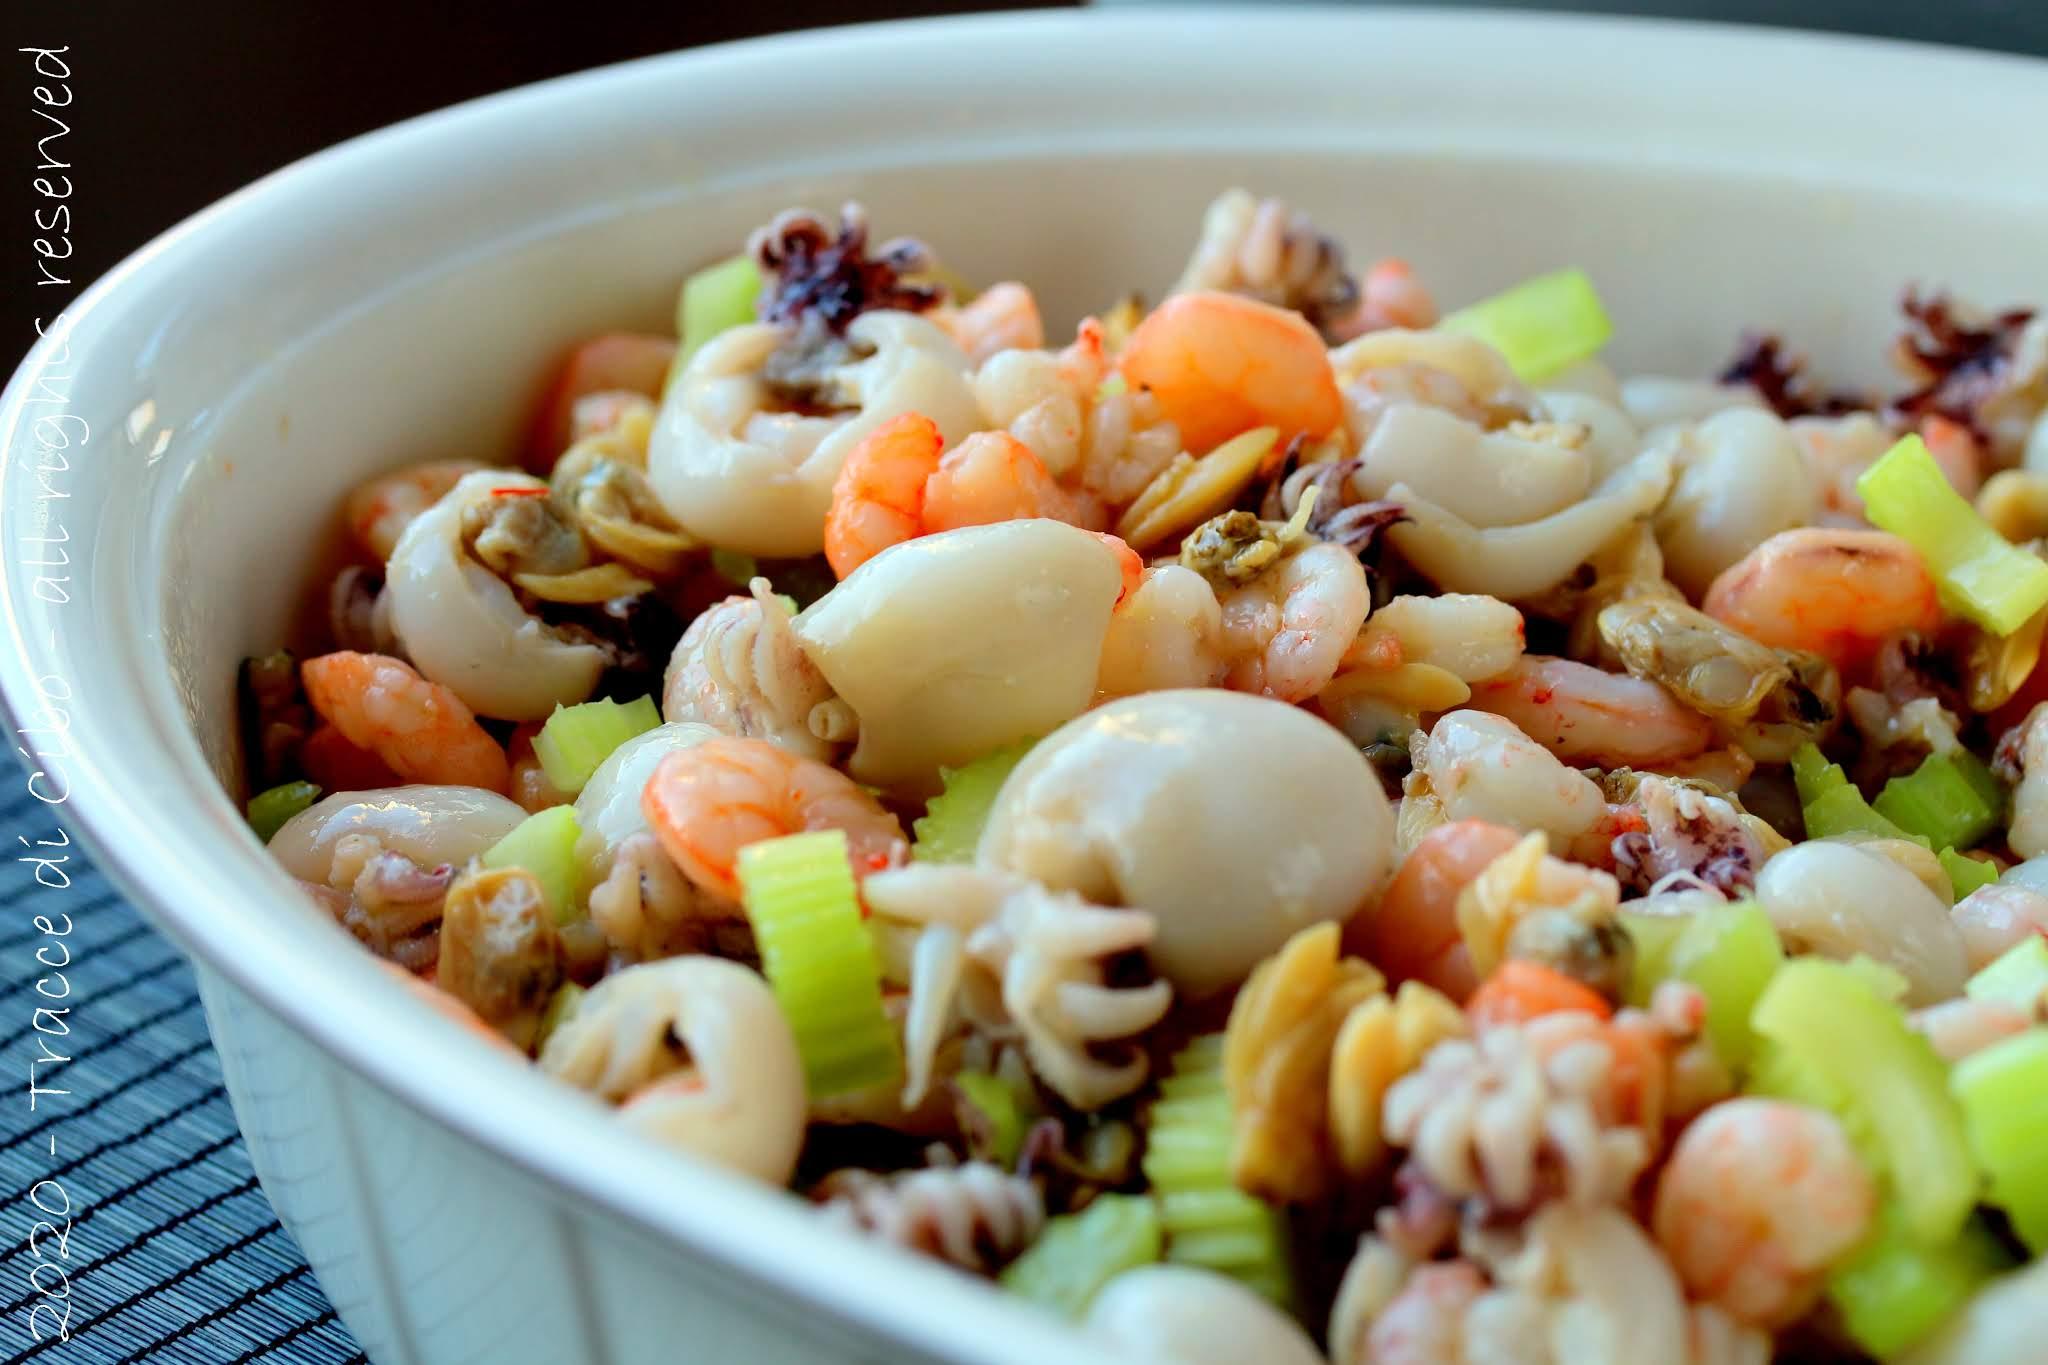 insalata di mare, seppie, gamberi, vongole